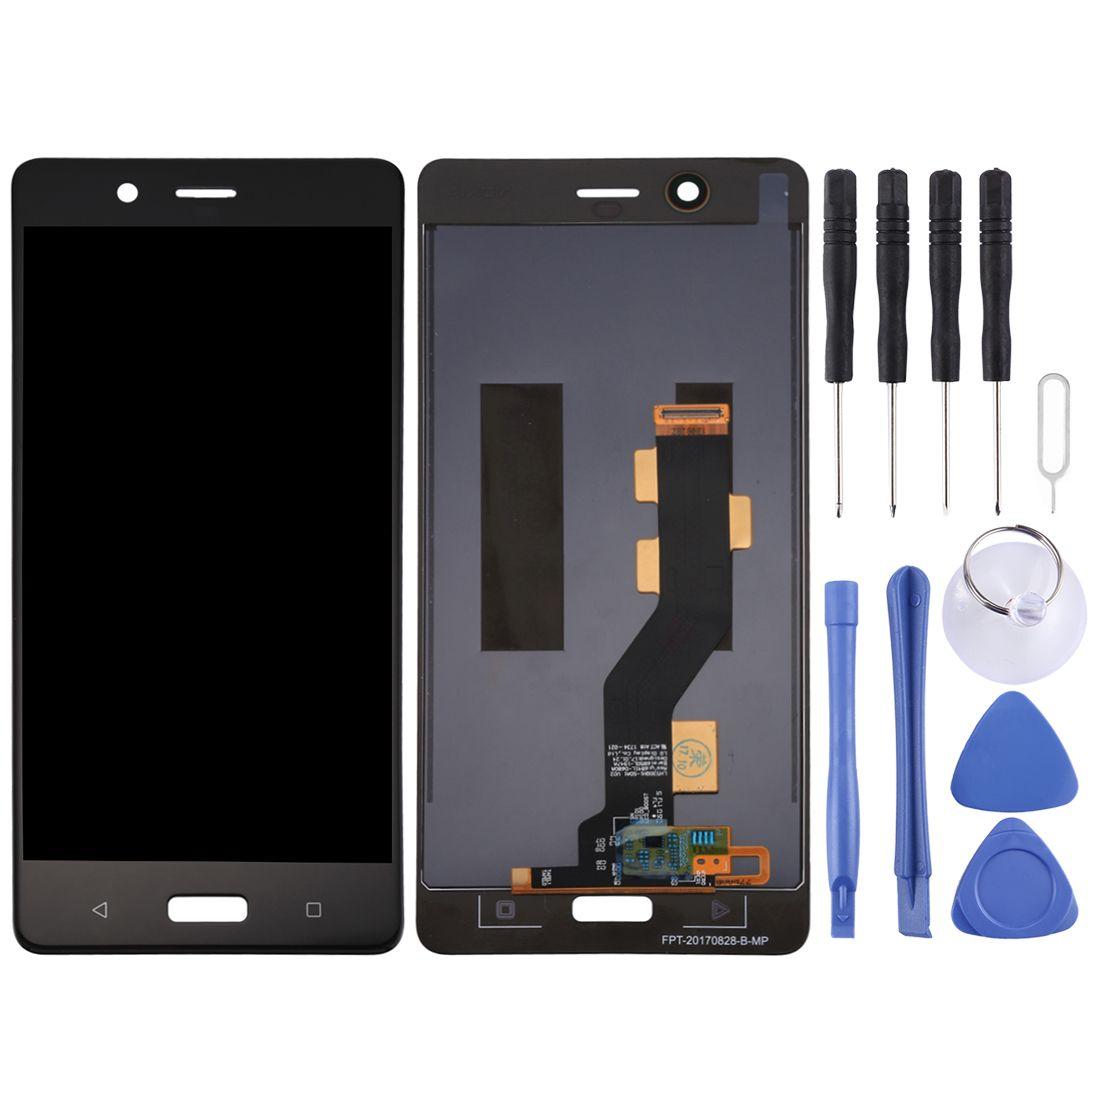 Tela LCD e digitador Assembléia completa para Nokia 8 / N8 TA-1012 TA-1004 TA-1052